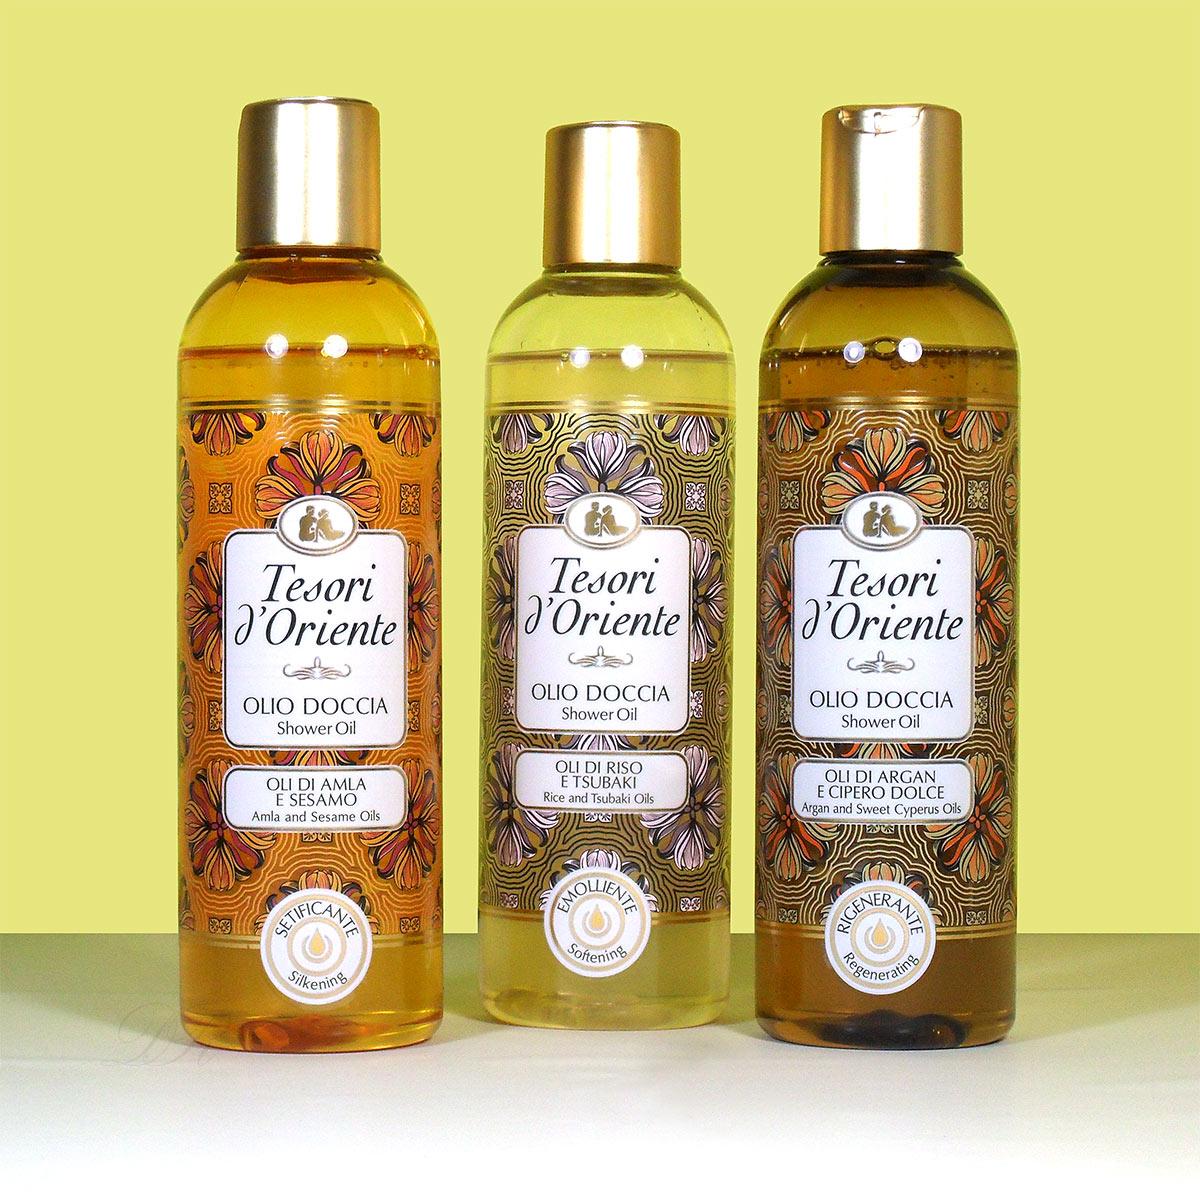 Tesori d'Oriente shower oil